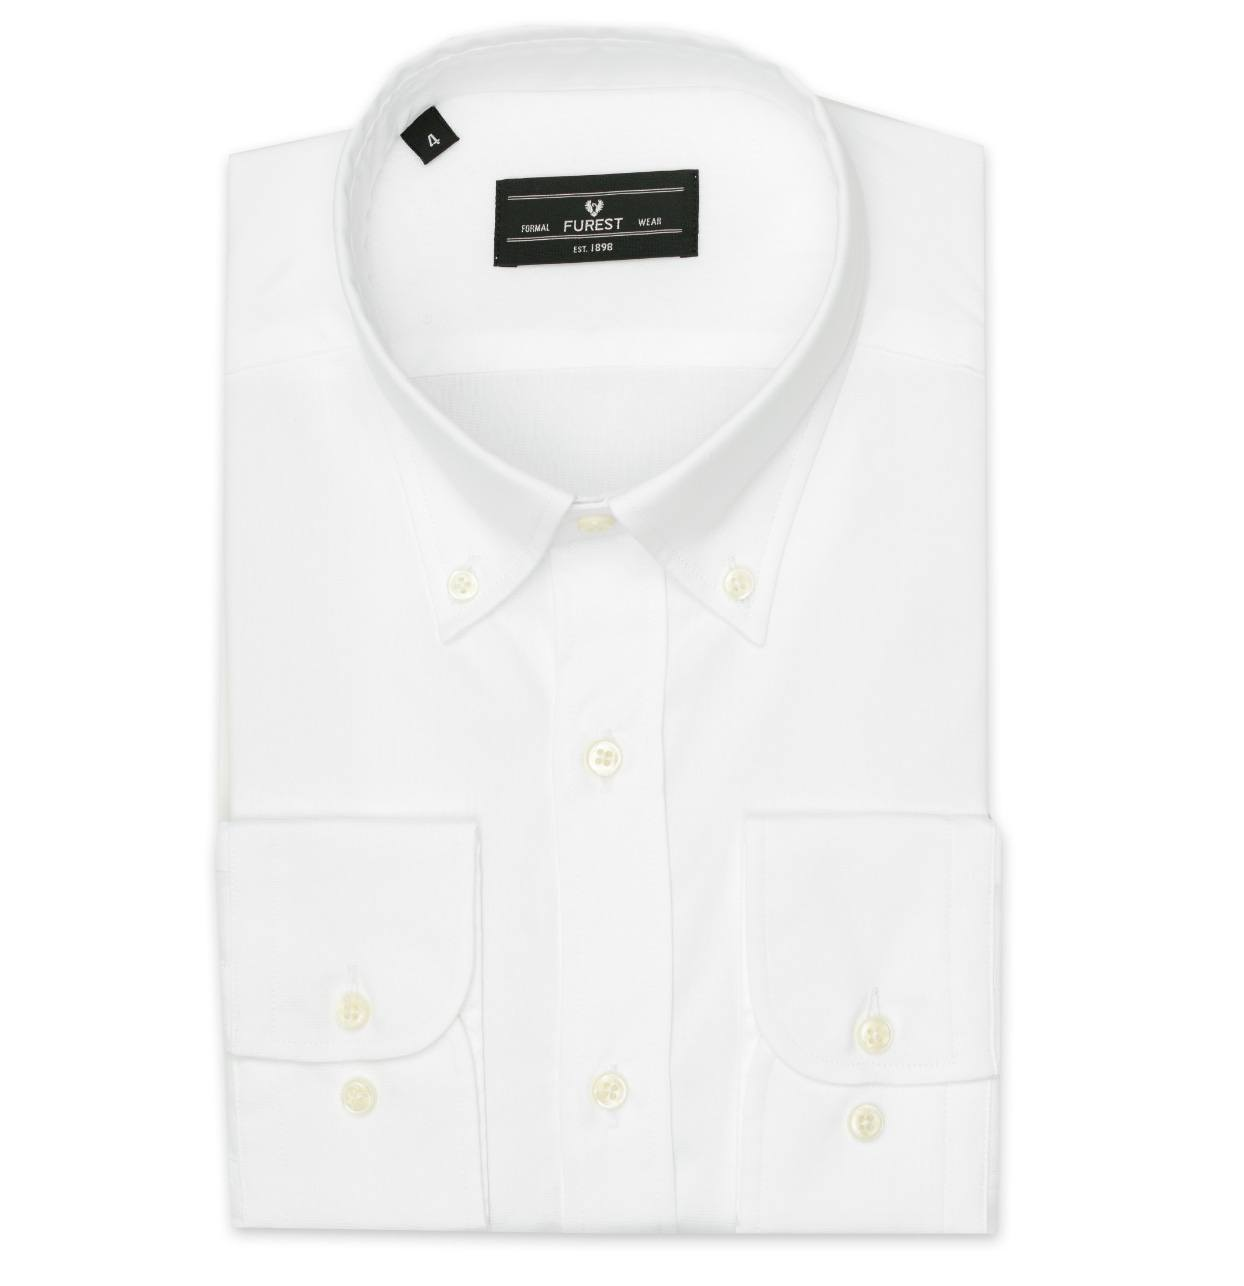 Camisa Formal Wear REGULAR FIT Modelo BOTTON DOWN Tejido Pin point color blanco, 100% Algodón